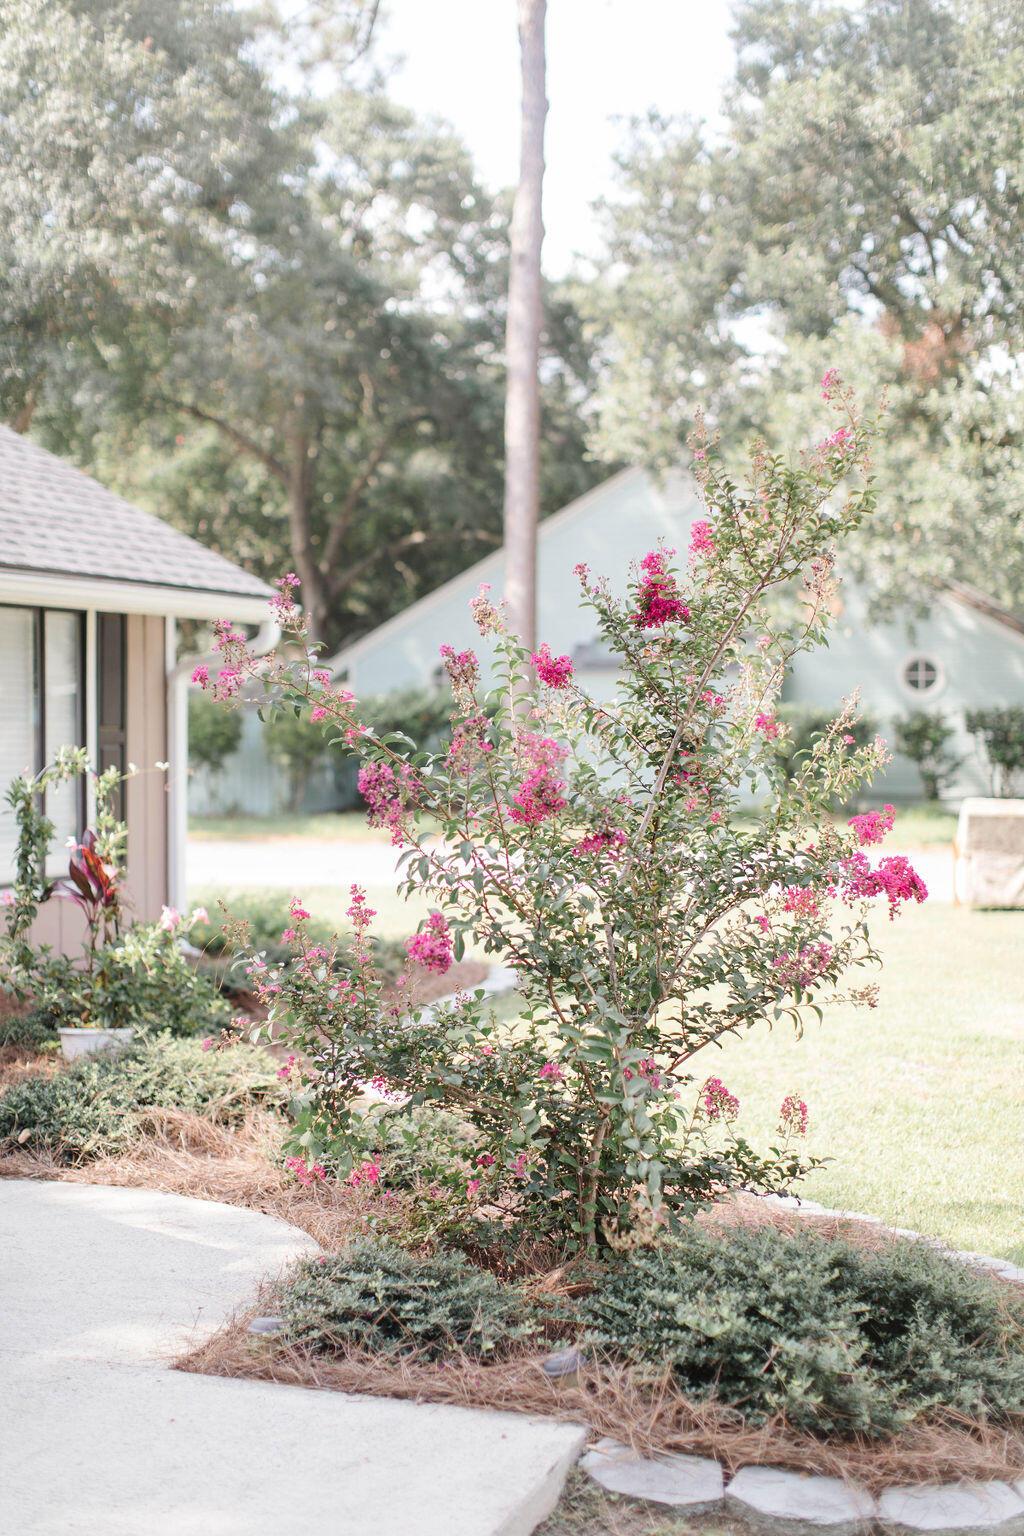 Snee Farm Homes For Sale - 1136 Honeysuckle, Mount Pleasant, SC - 10